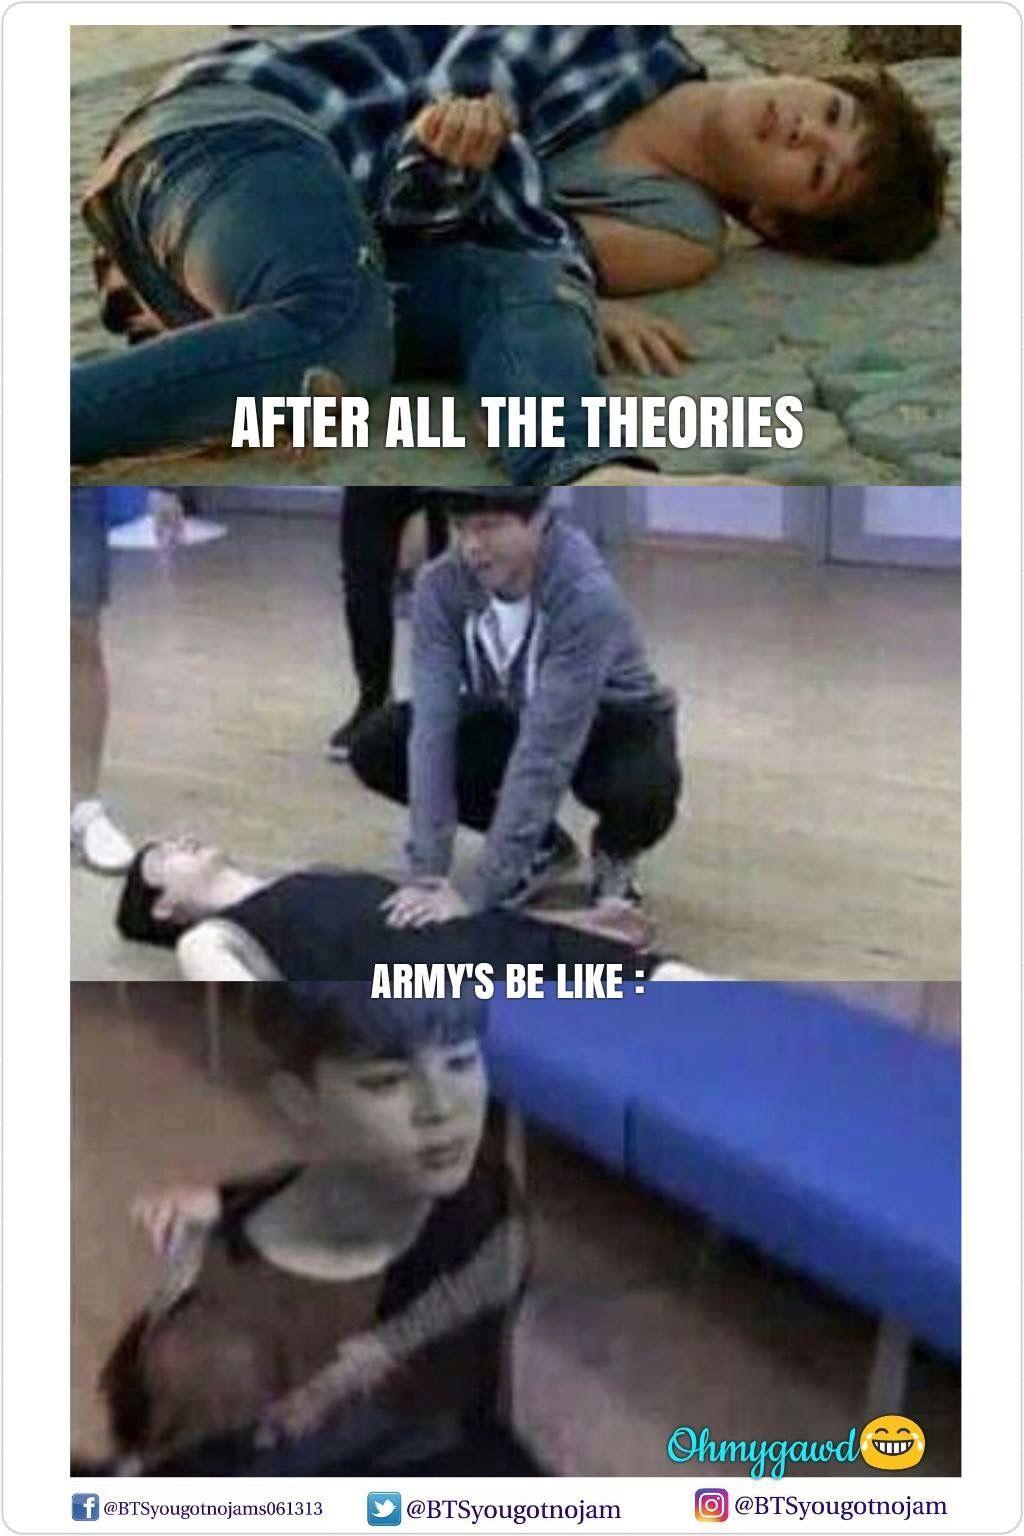 Pin by seokhye . on Kpop memes in 2019 Memes, Baseball